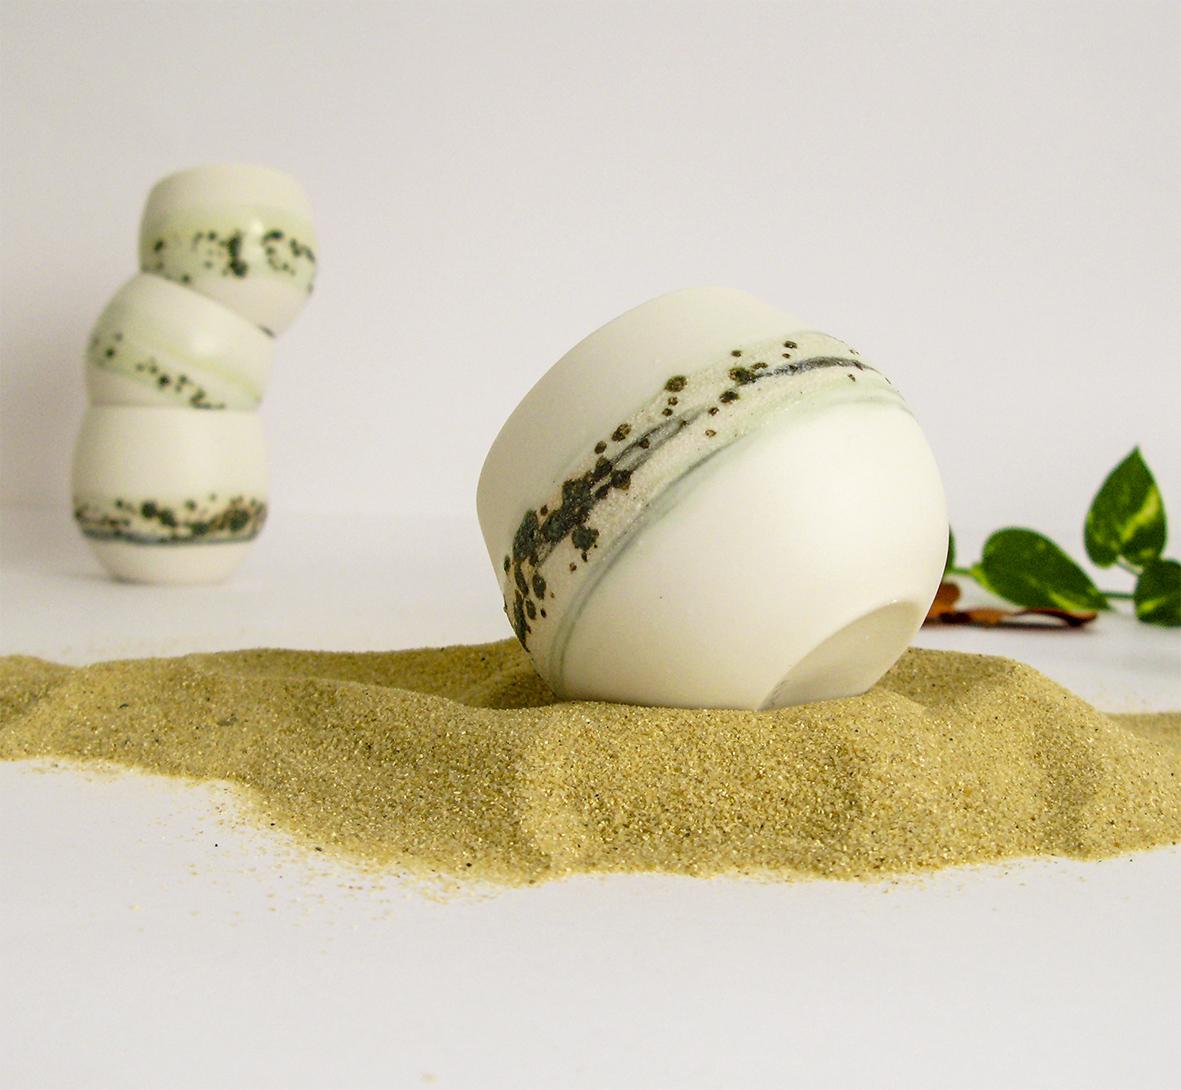 Tasse en porcelaine verte et blanche, sable et fleurs